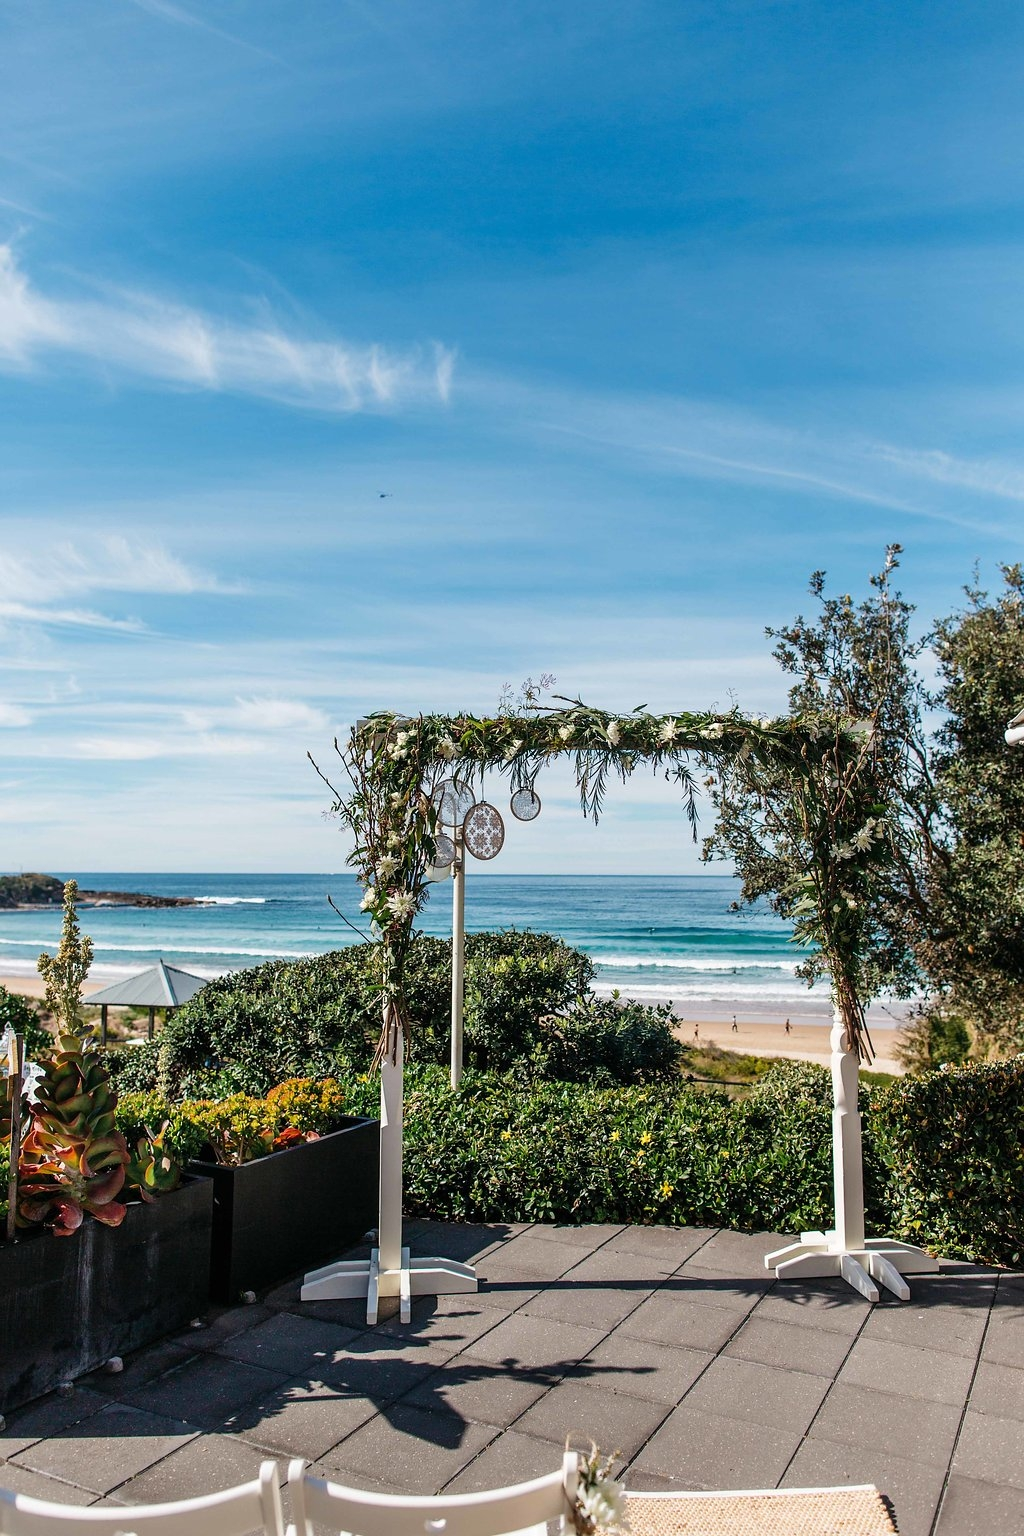 Bridal_Arch_Hire_Manly_Northern_Beaches_Wedding.jpg